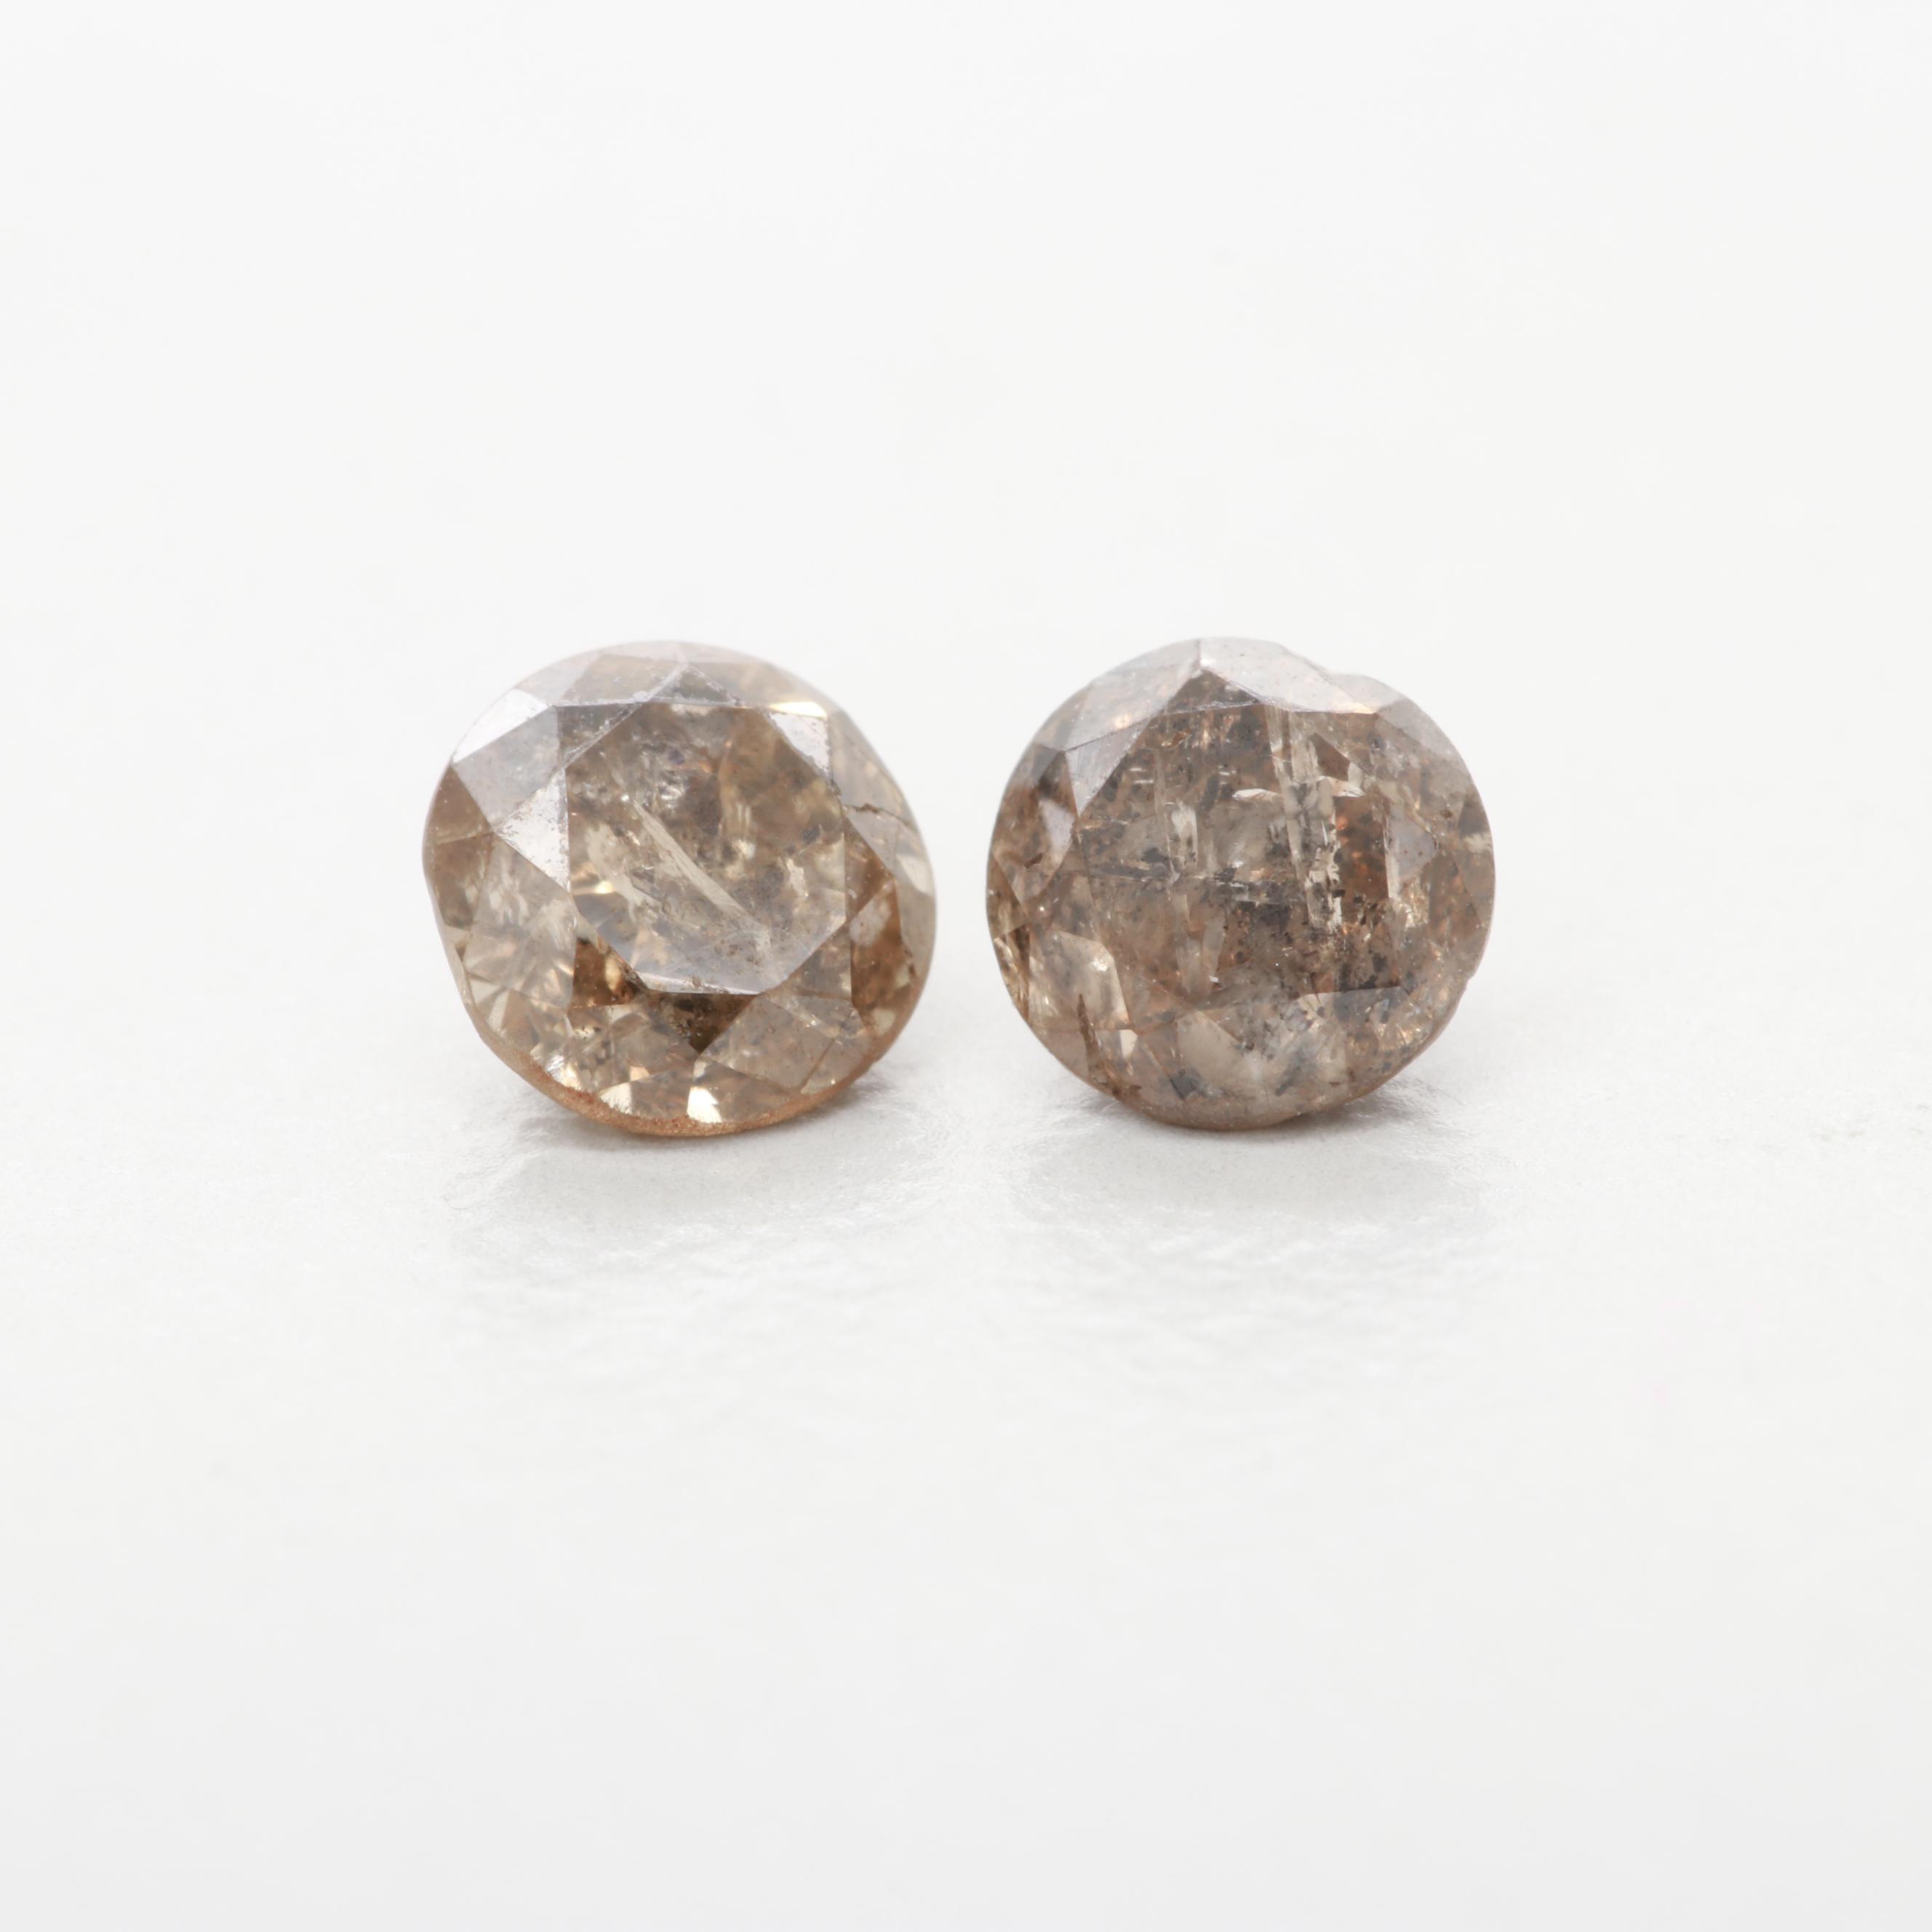 Loose 0.85 CTW Brown Diamond Gemstones